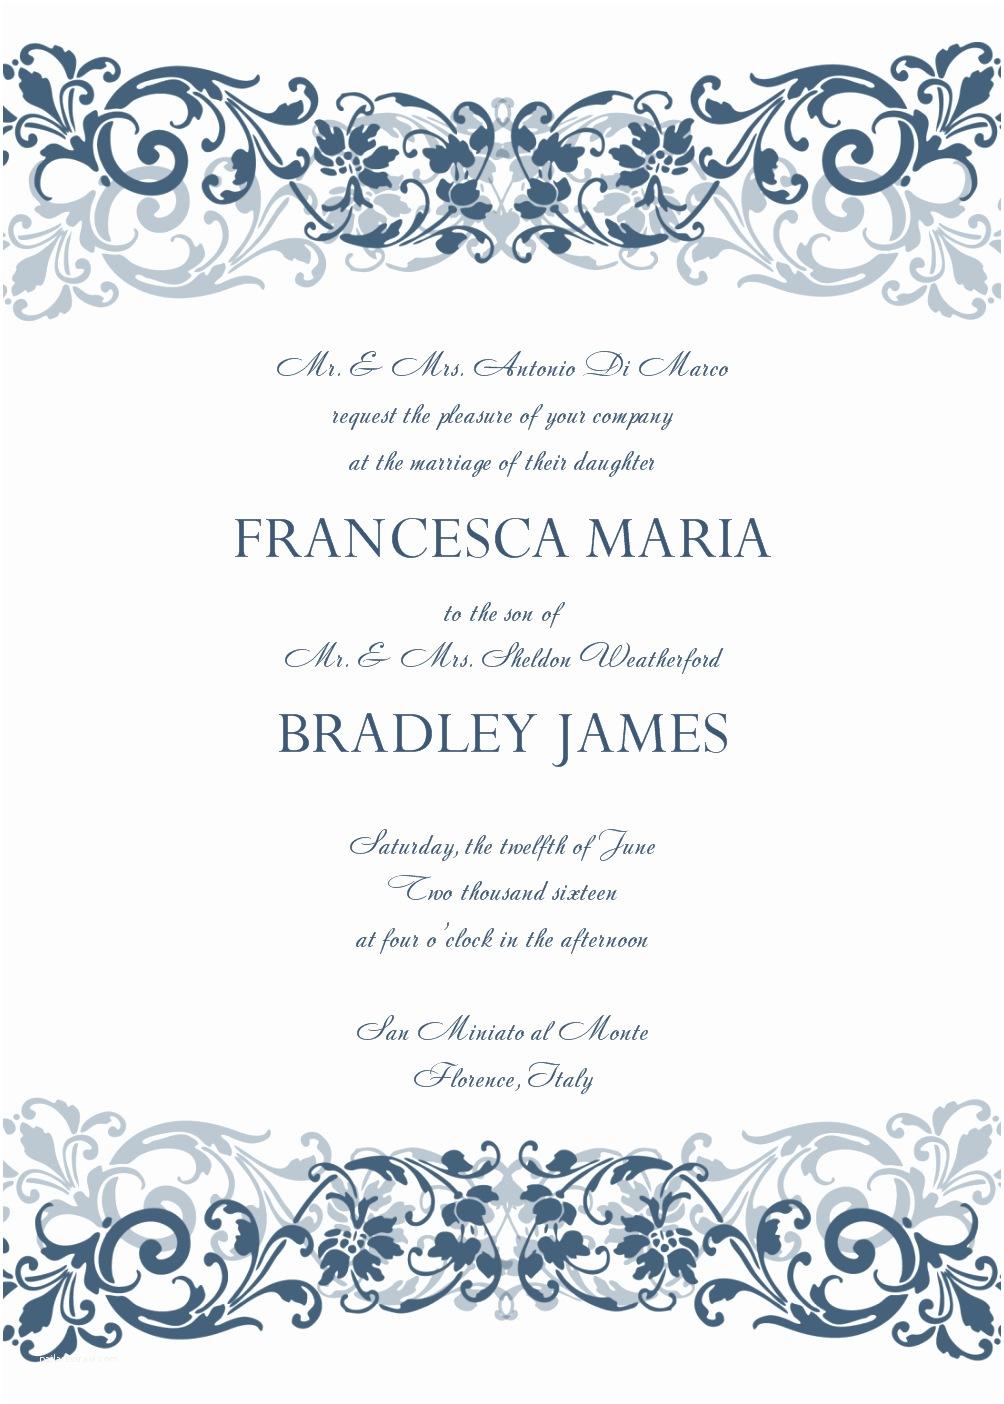 Wedding Invite Directions Template 8 Microsoft Word Wedding Invitation Templates